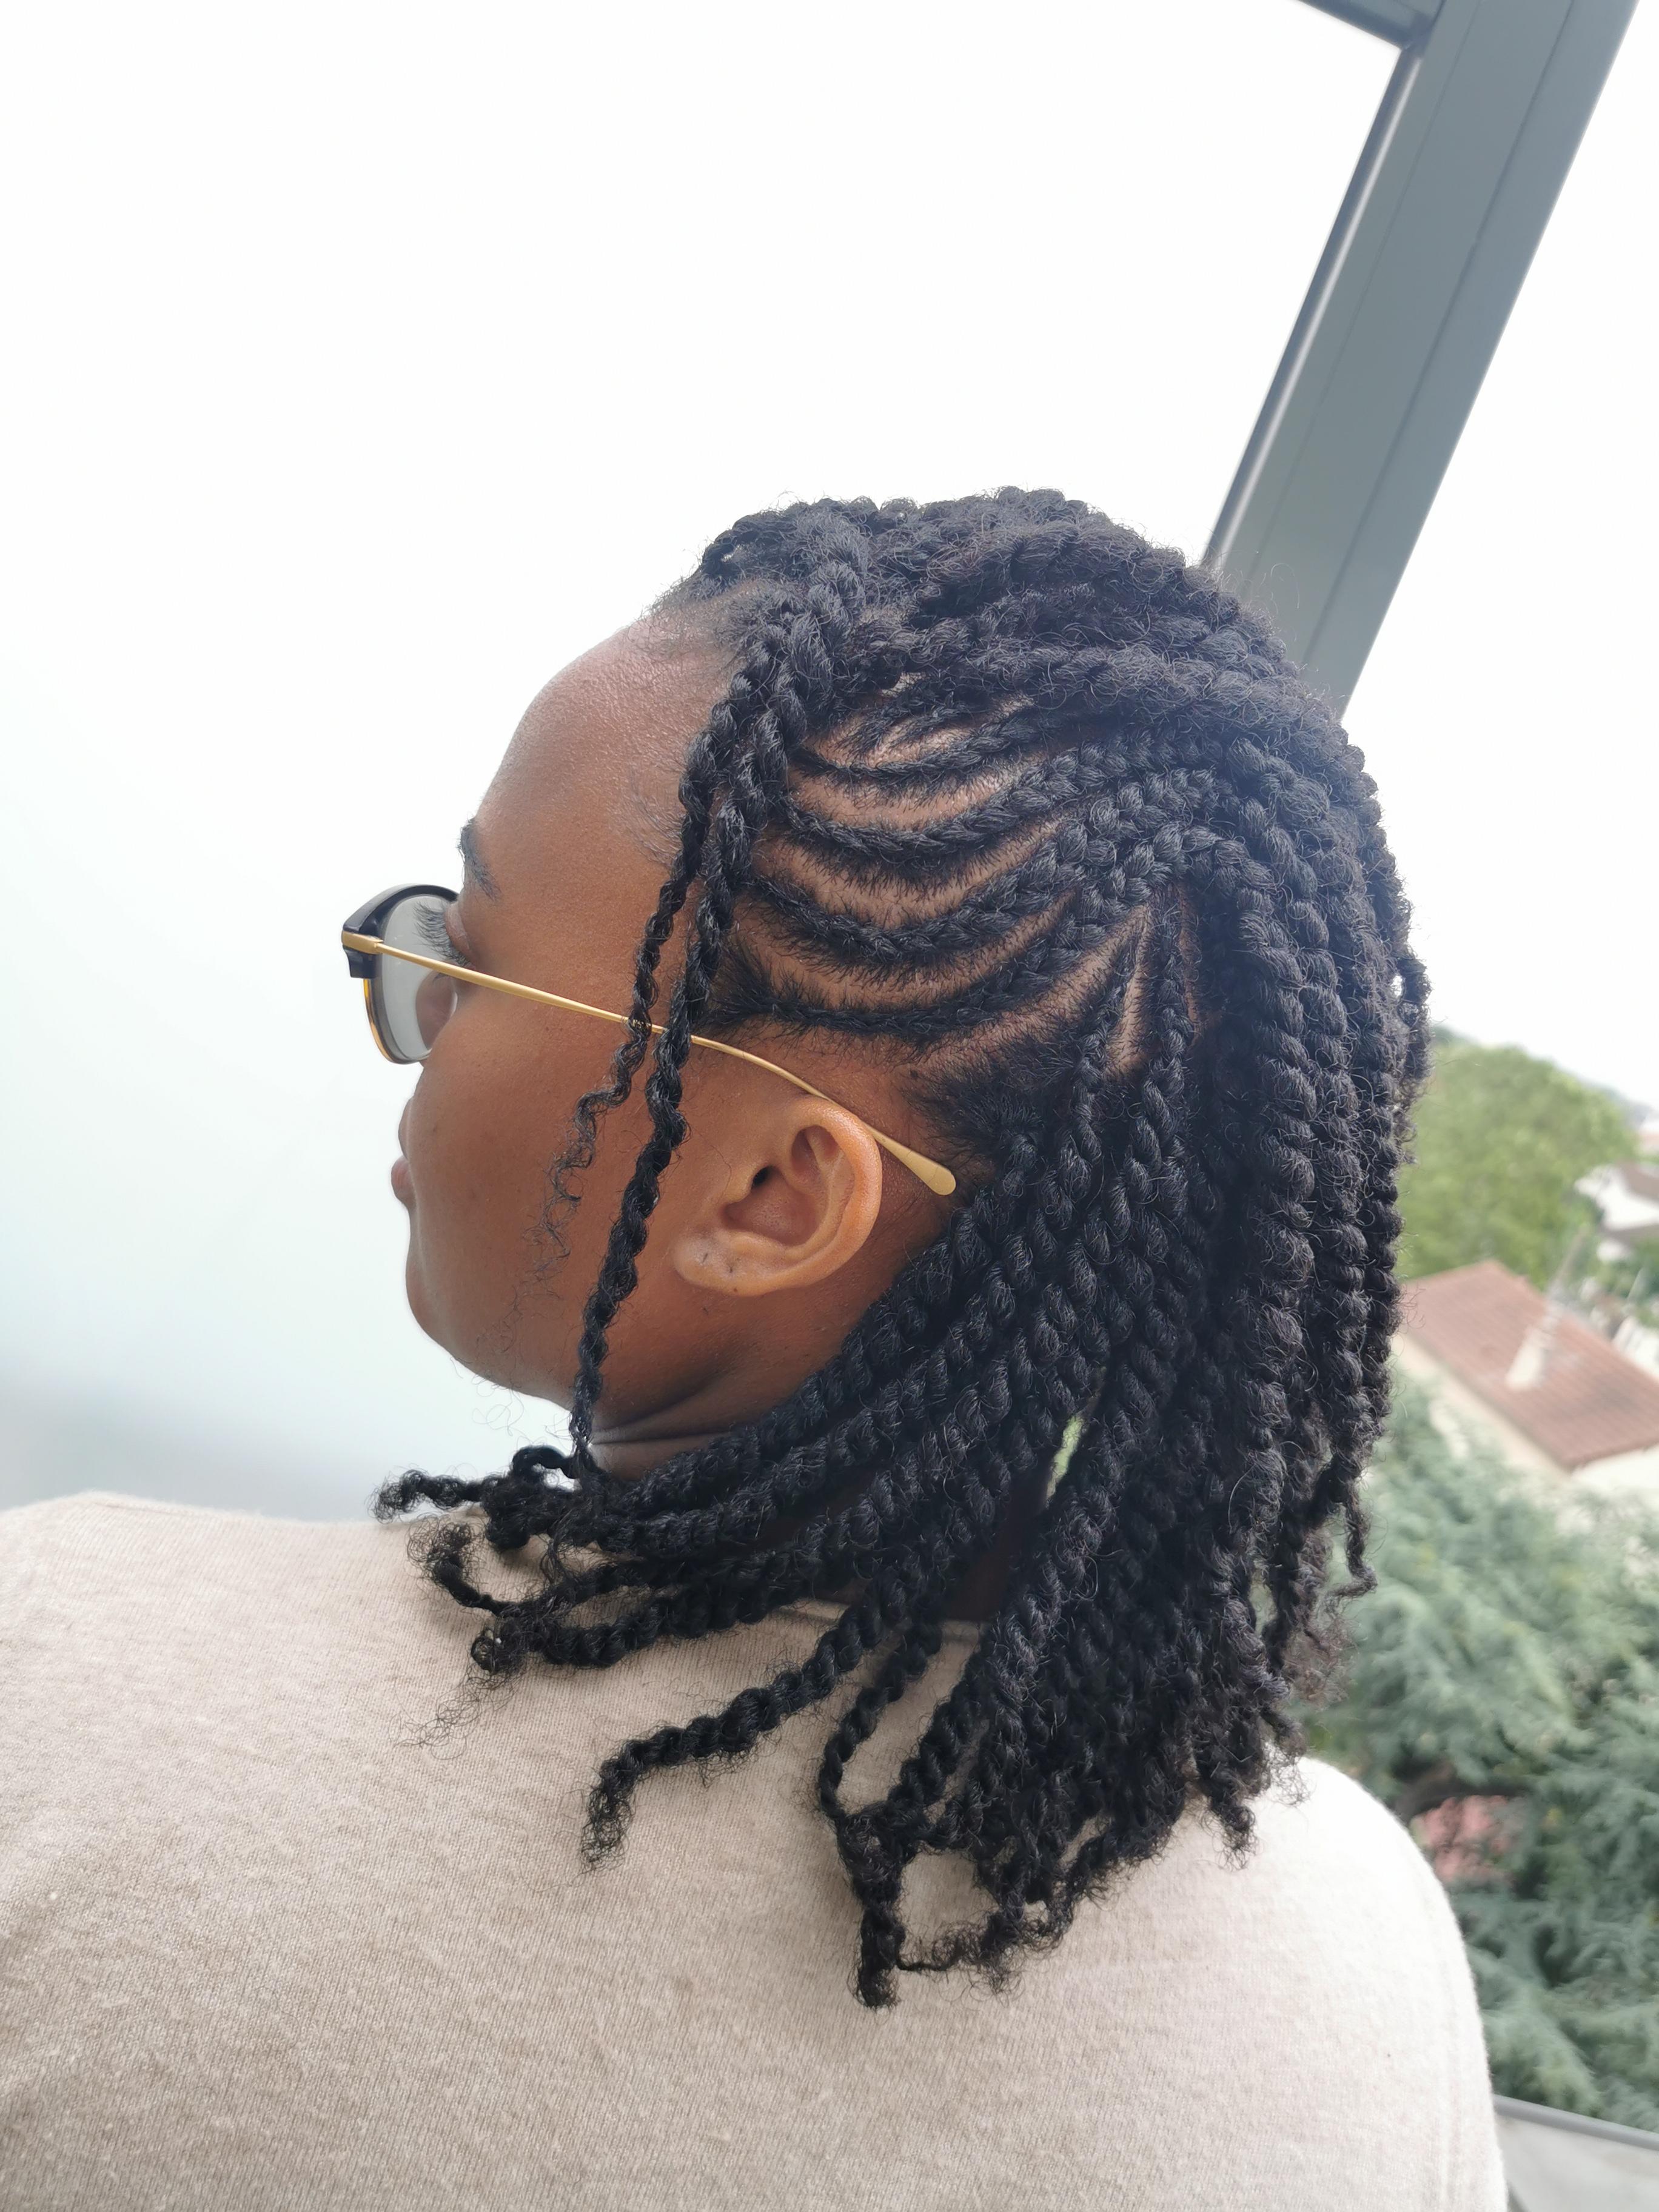 salon de coiffure afro tresse tresses box braids crochet braids vanilles tissages paris 75 77 78 91 92 93 94 95 RALDOPXA